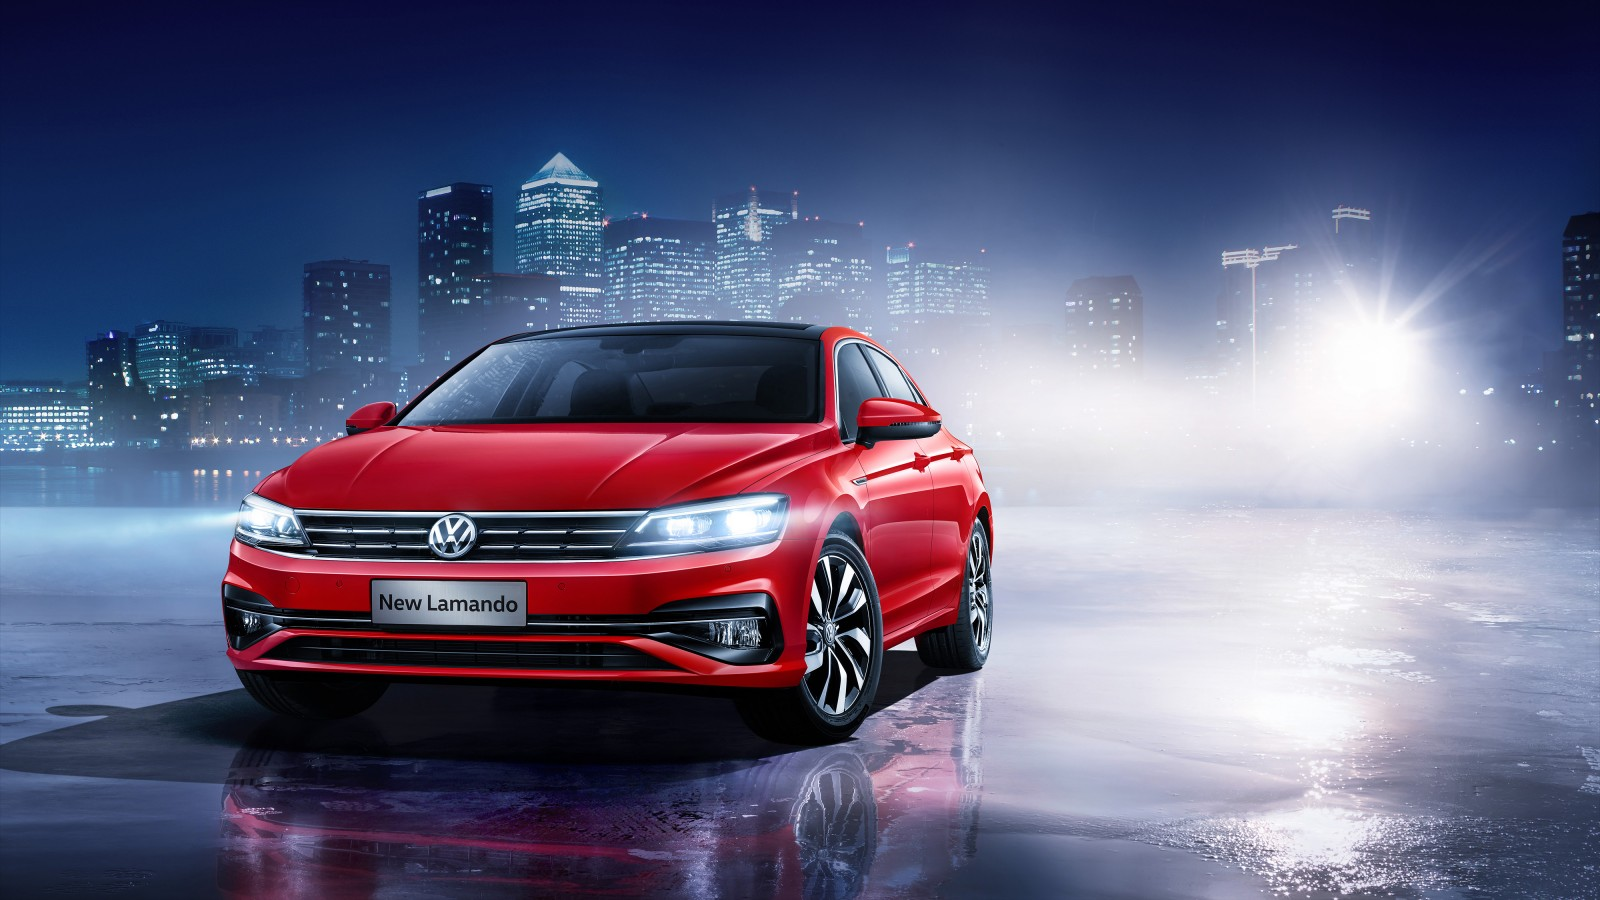 Volkswagen Lamando 2018 4K Wallpaper | HD Car Wallpapers ...